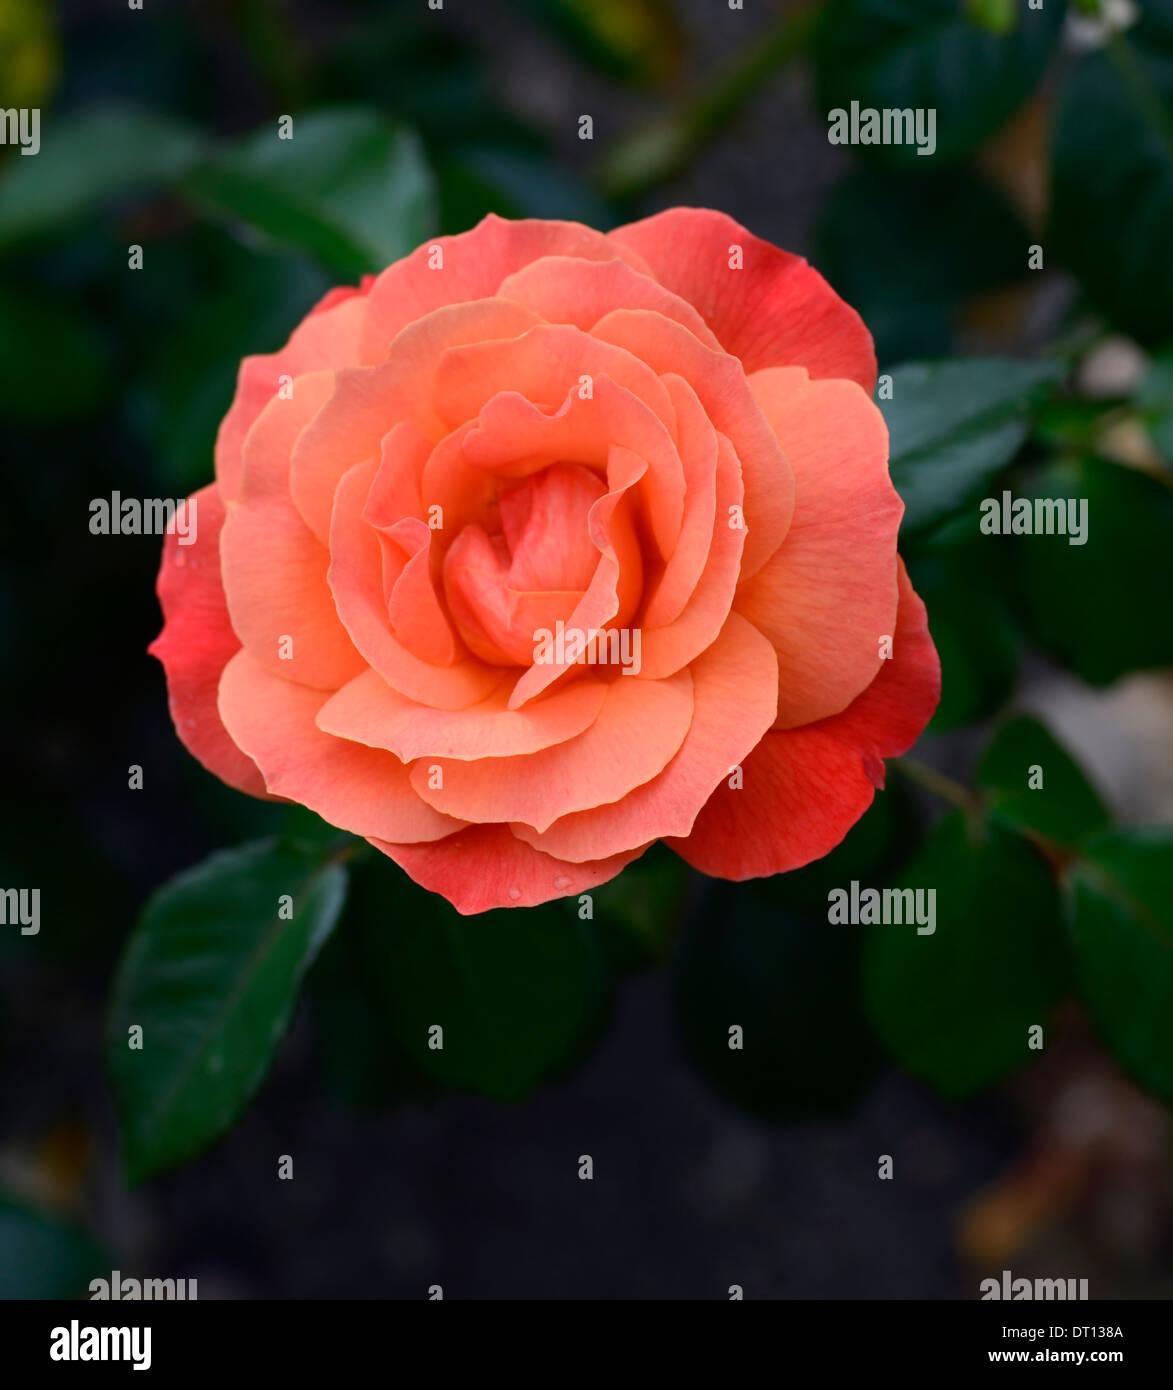 Becas arbusto Harwelcome rosa rosas rosas flores de naranja flor floración floración Imagen De Stock